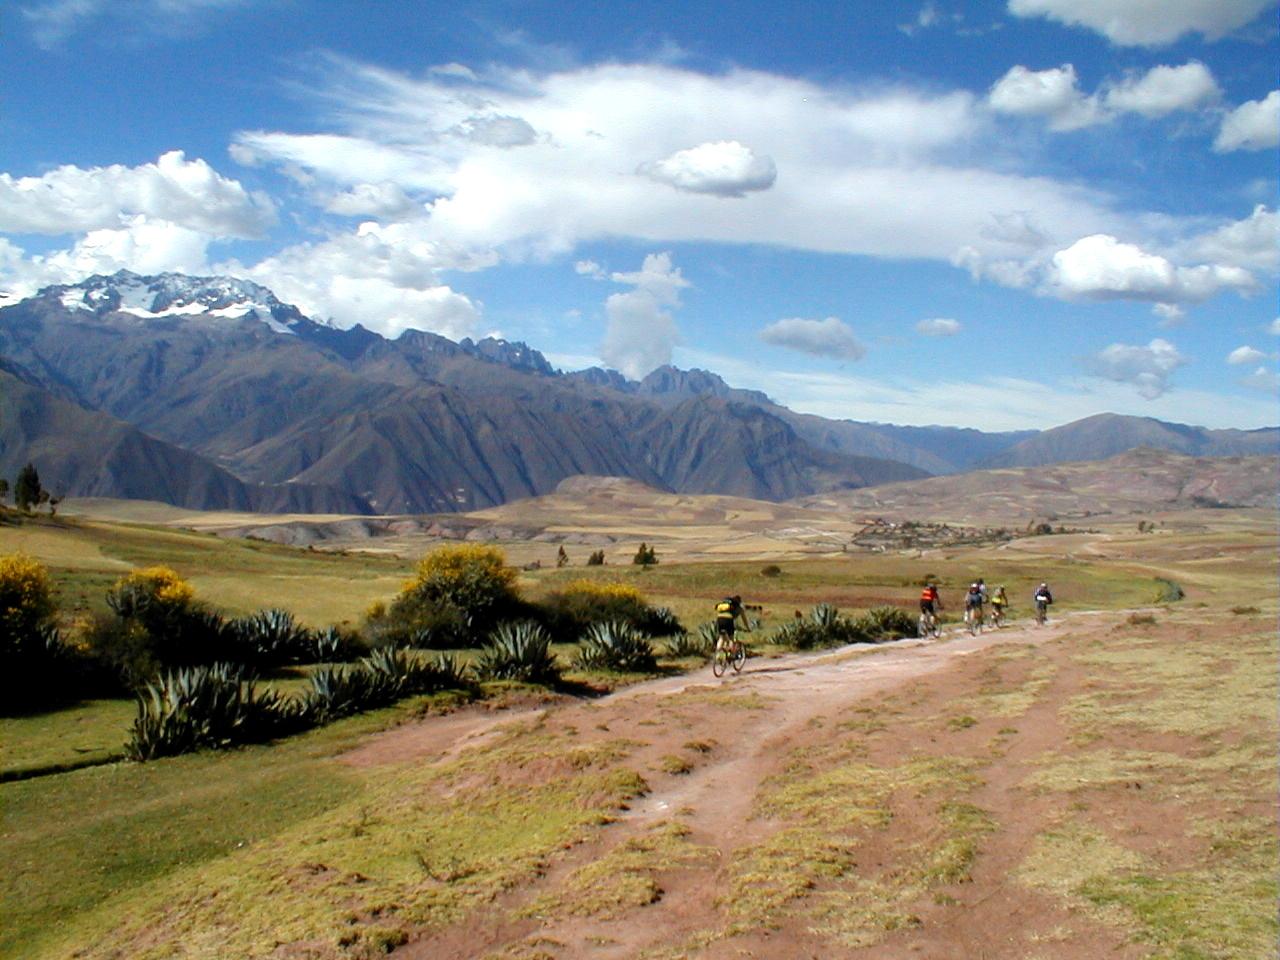 06 Ride to Maras